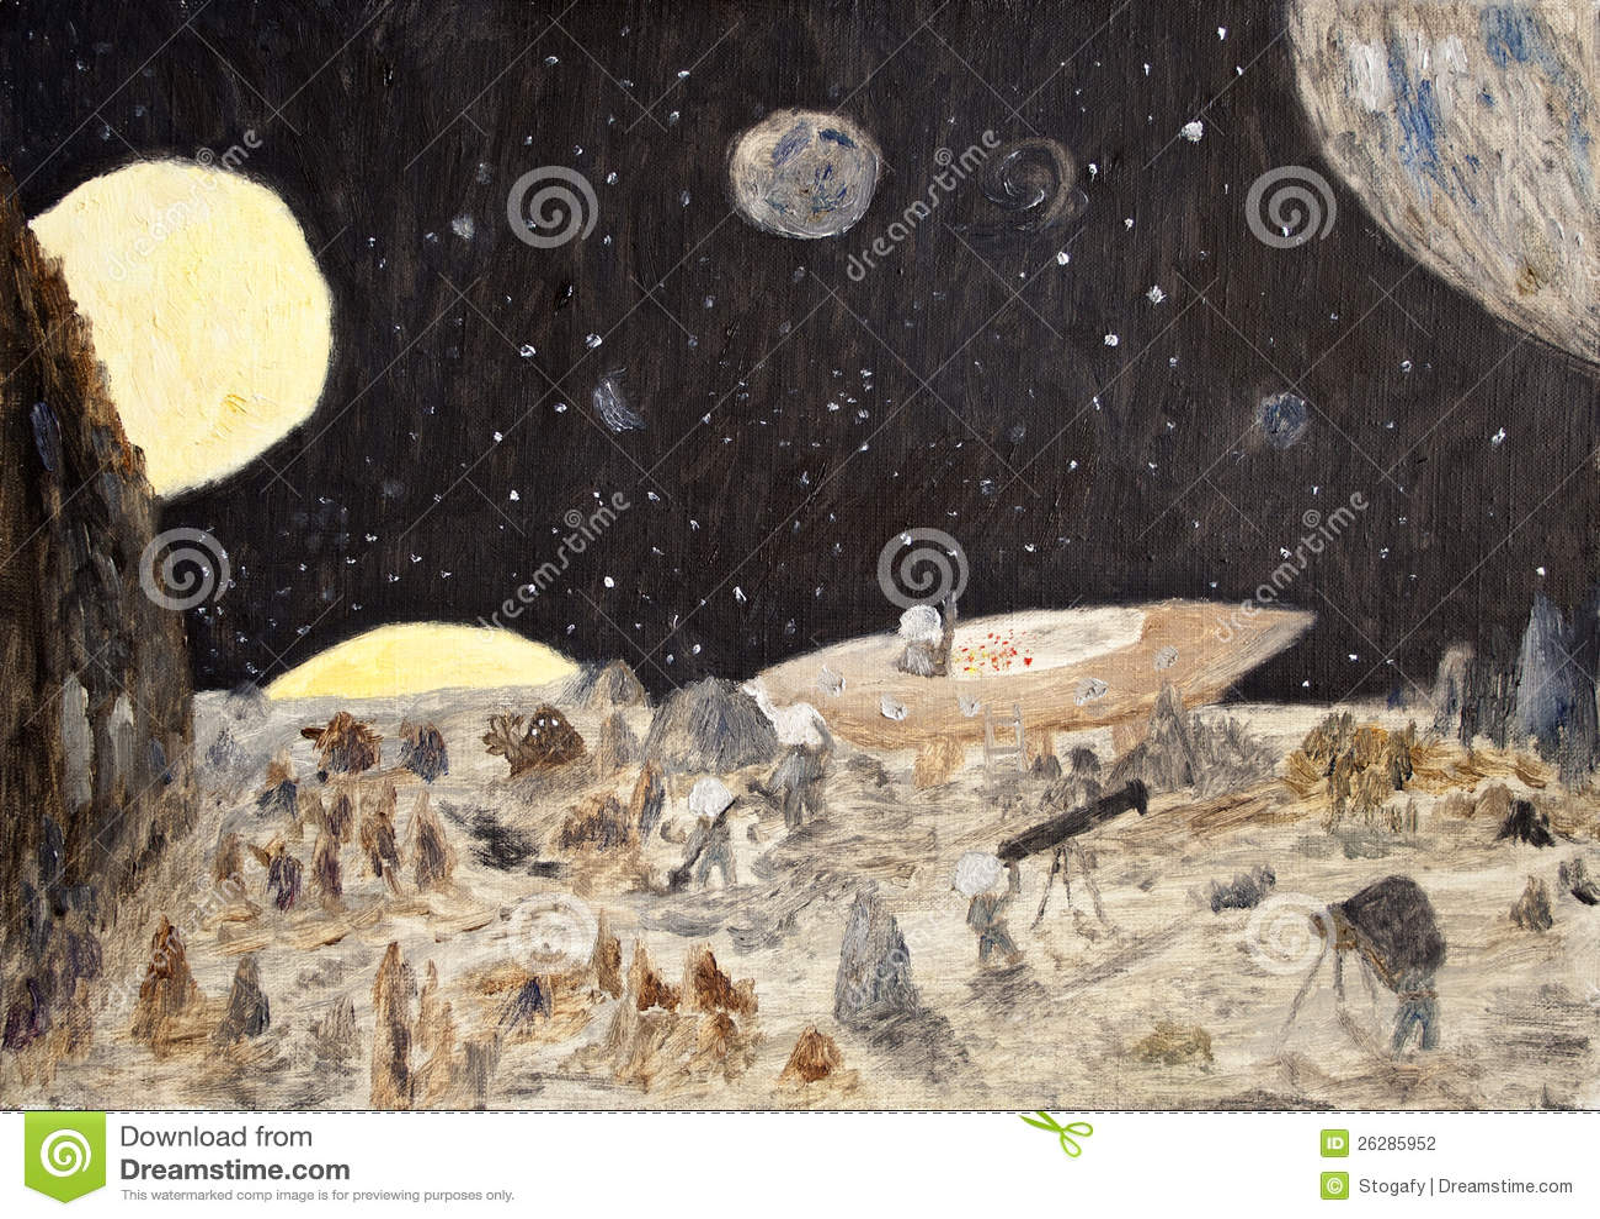 Cosmos fantasy oil painting